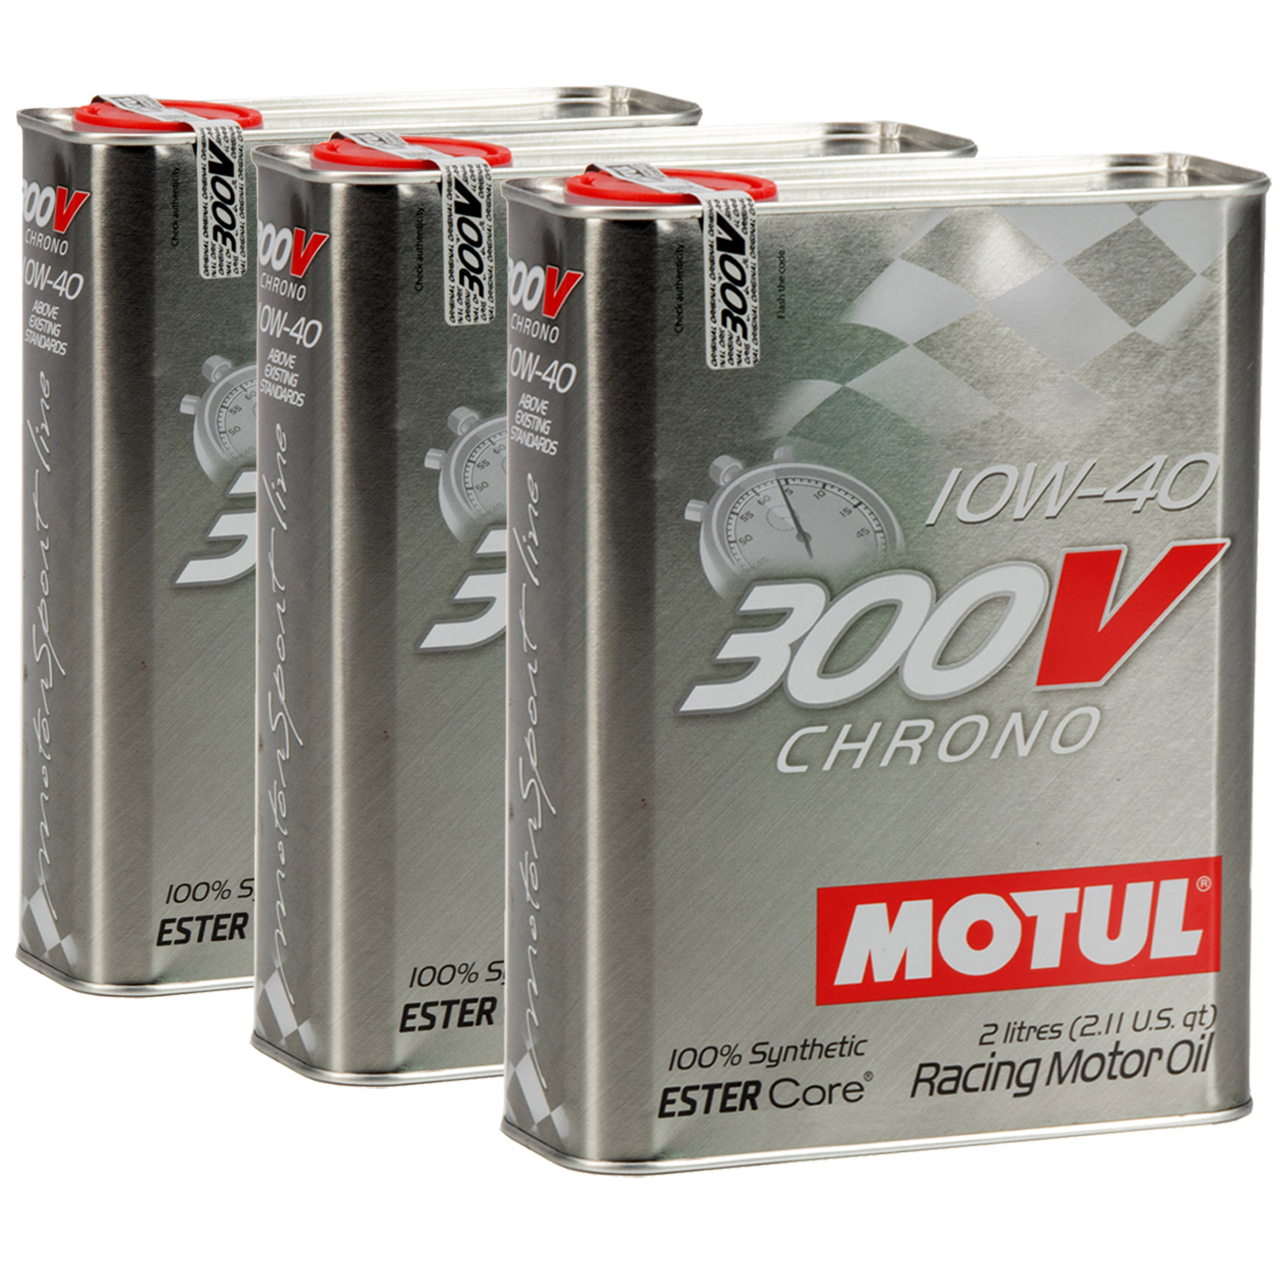 MOTUL 300V CHRONO Motoröl Öl 10W40 100% Synthetic Ester Core - 6L 6 Liter